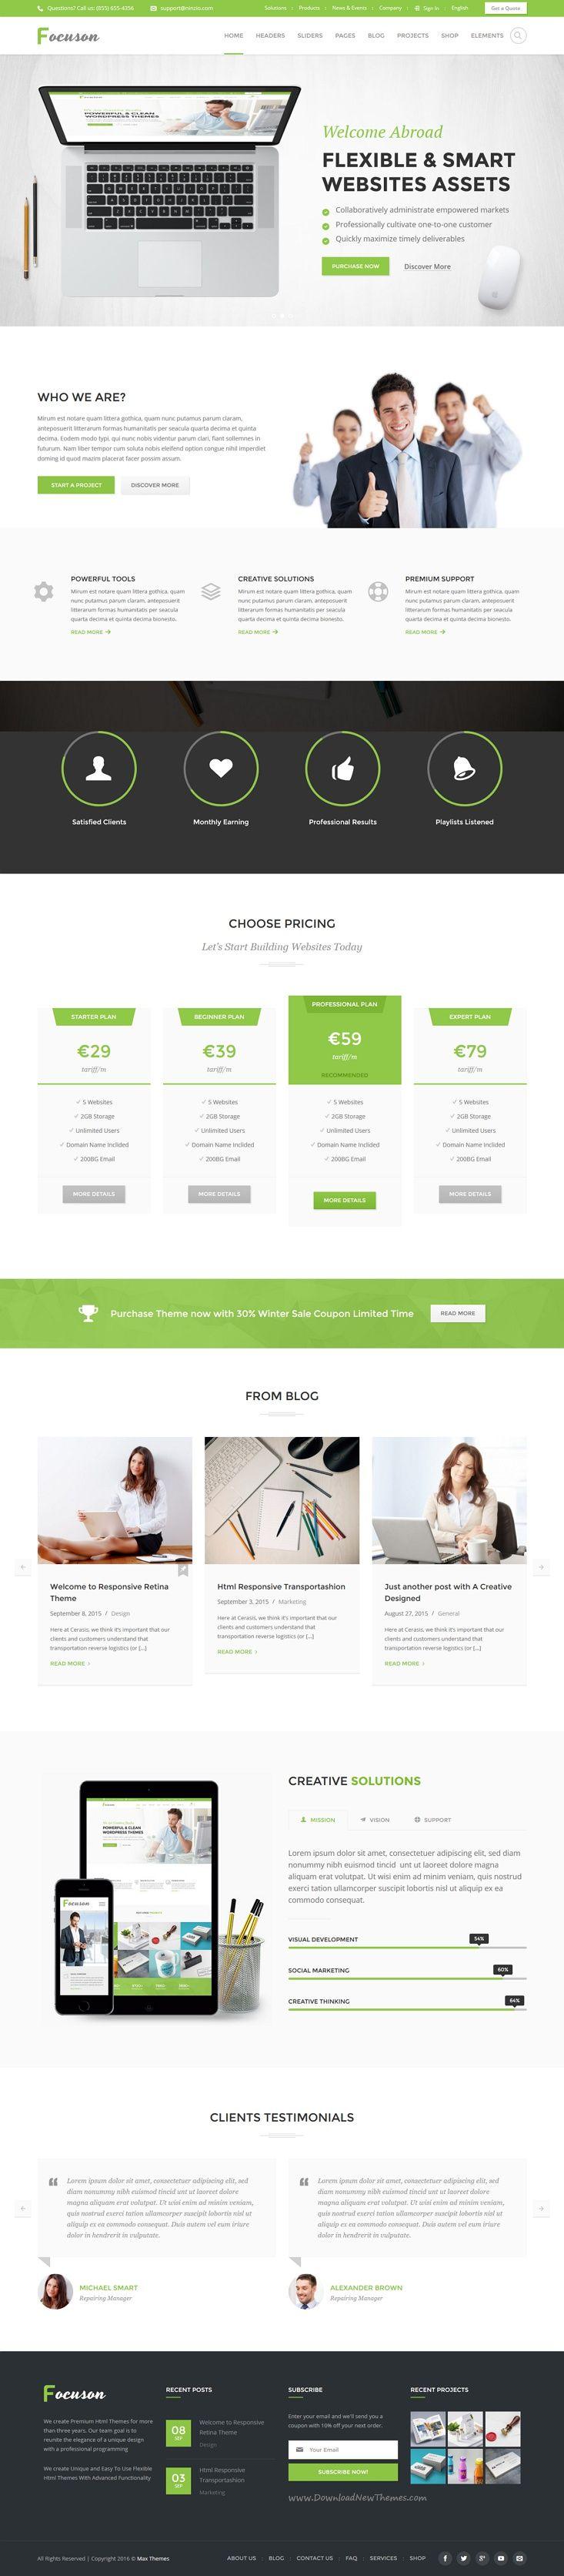 website templates designs